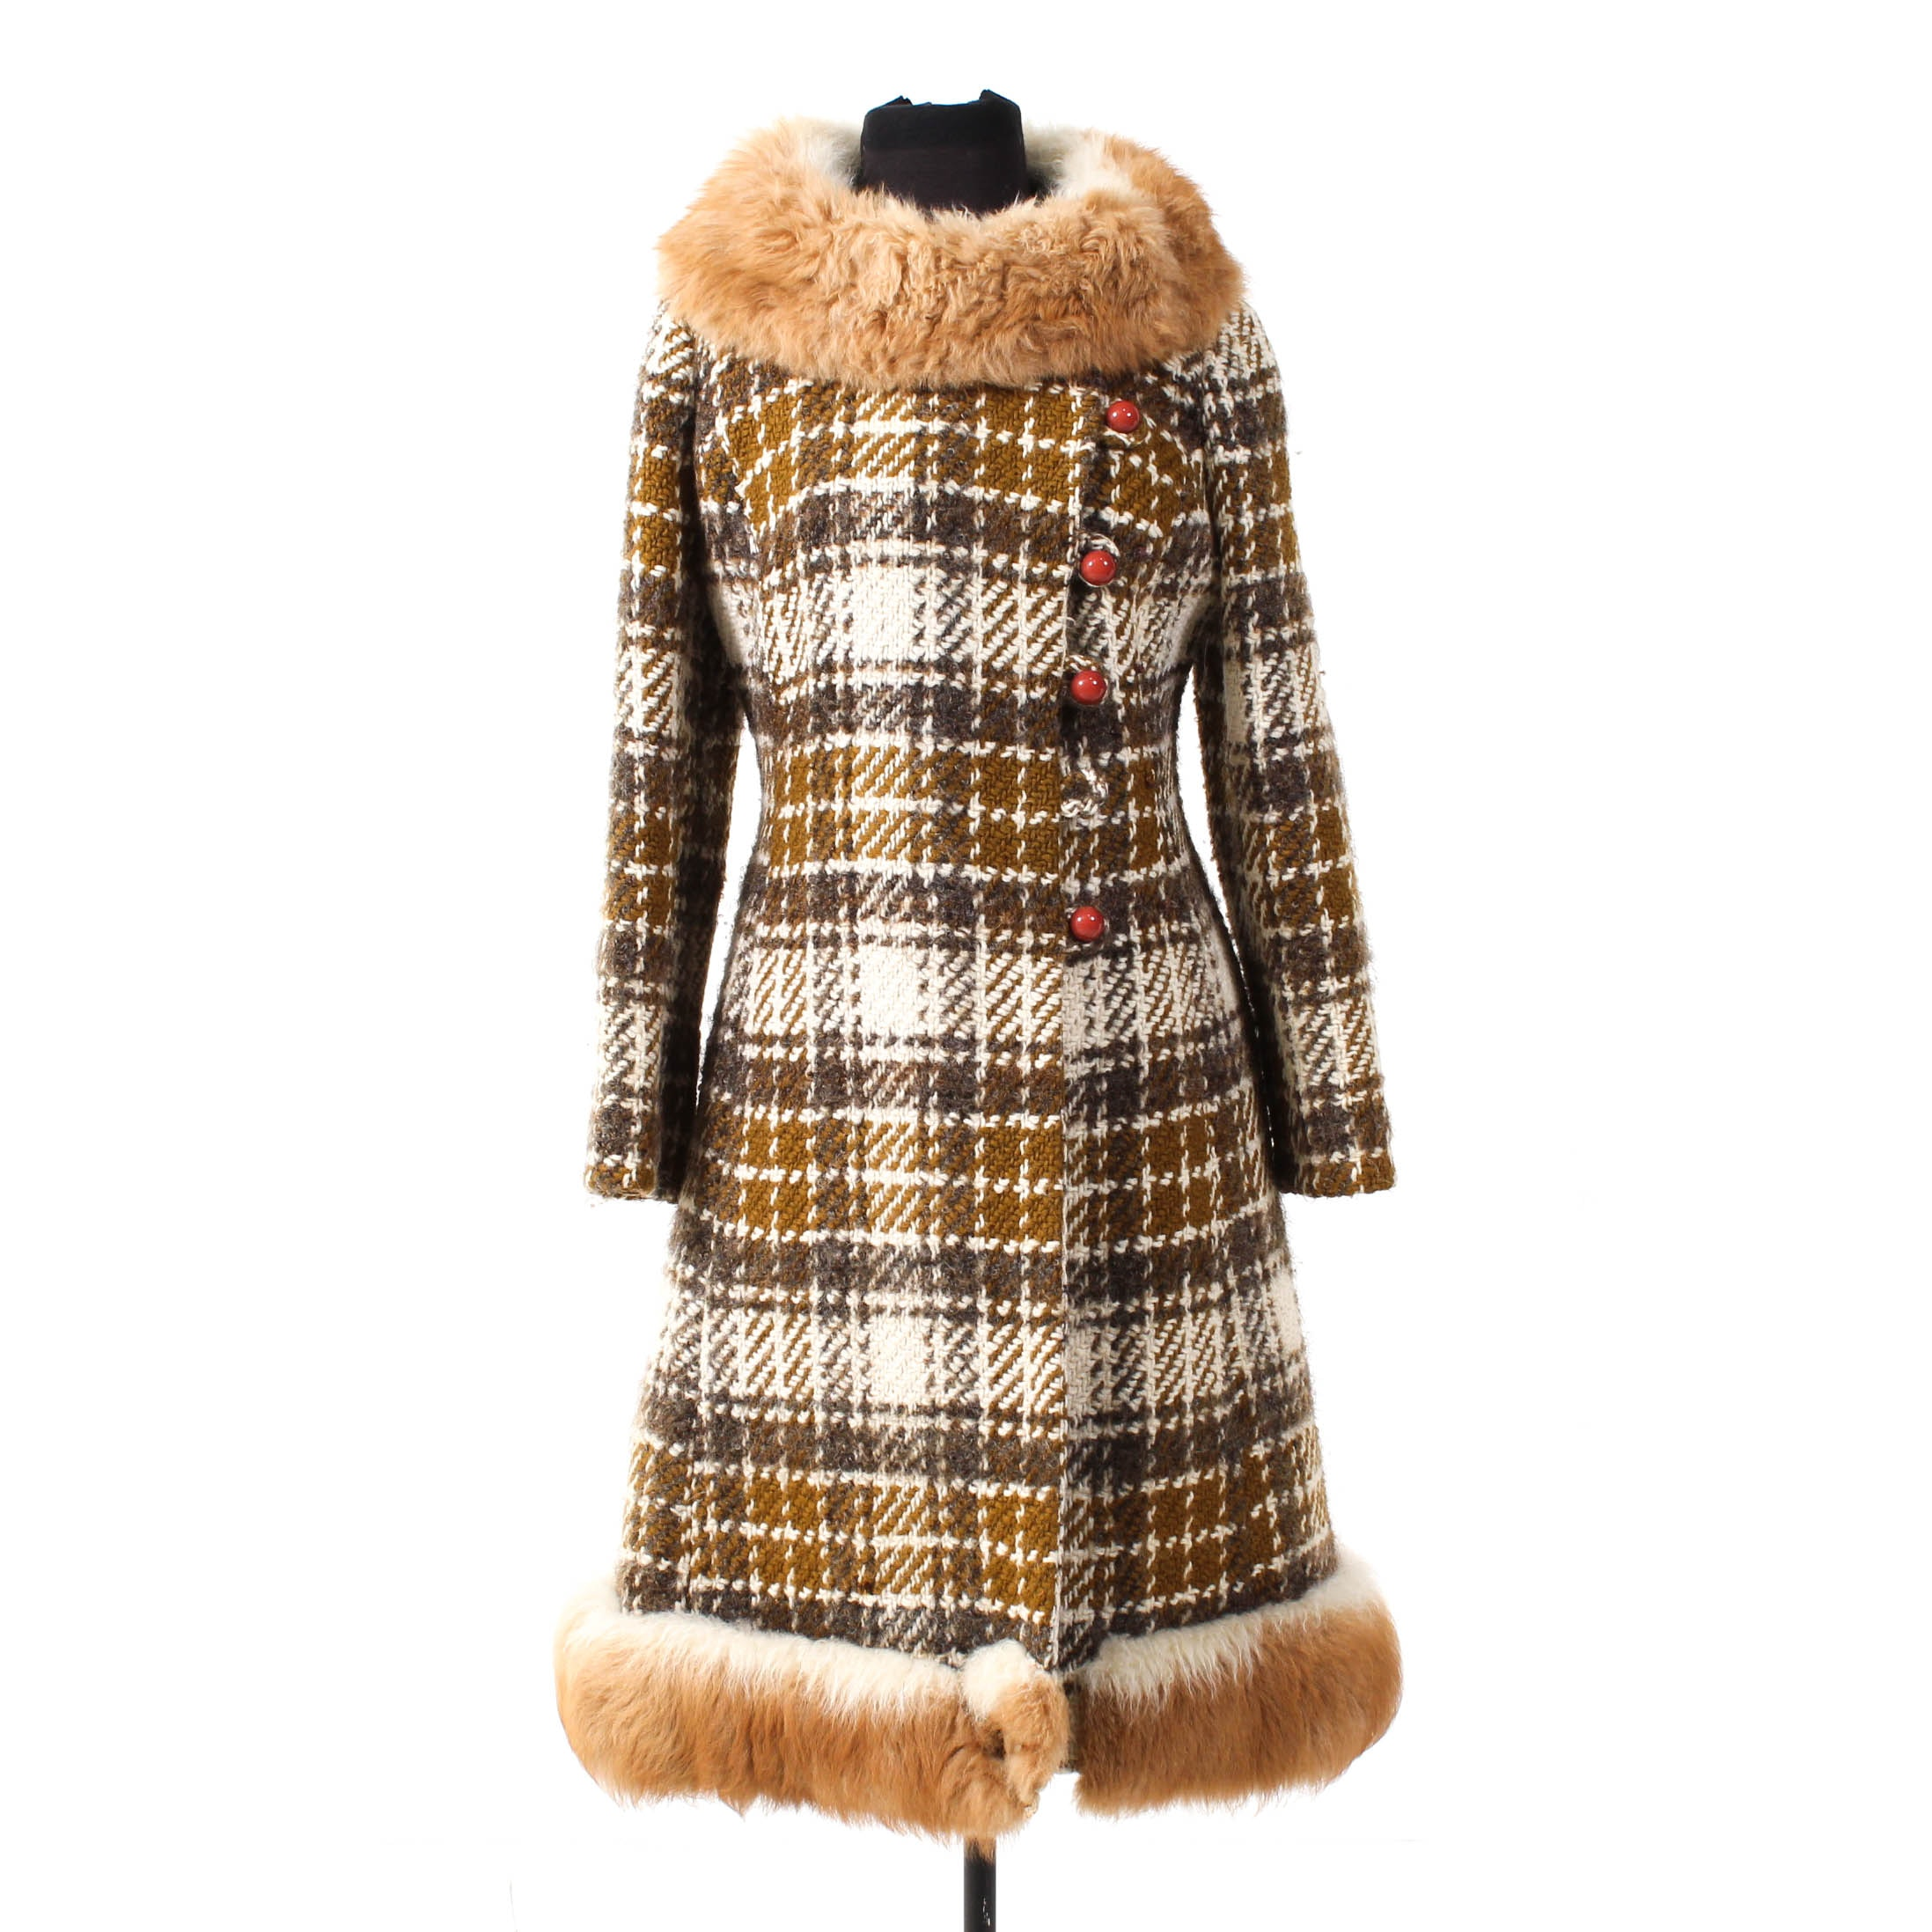 Vintage Guanaco Fur-Trimmed Plaid Wool Coat